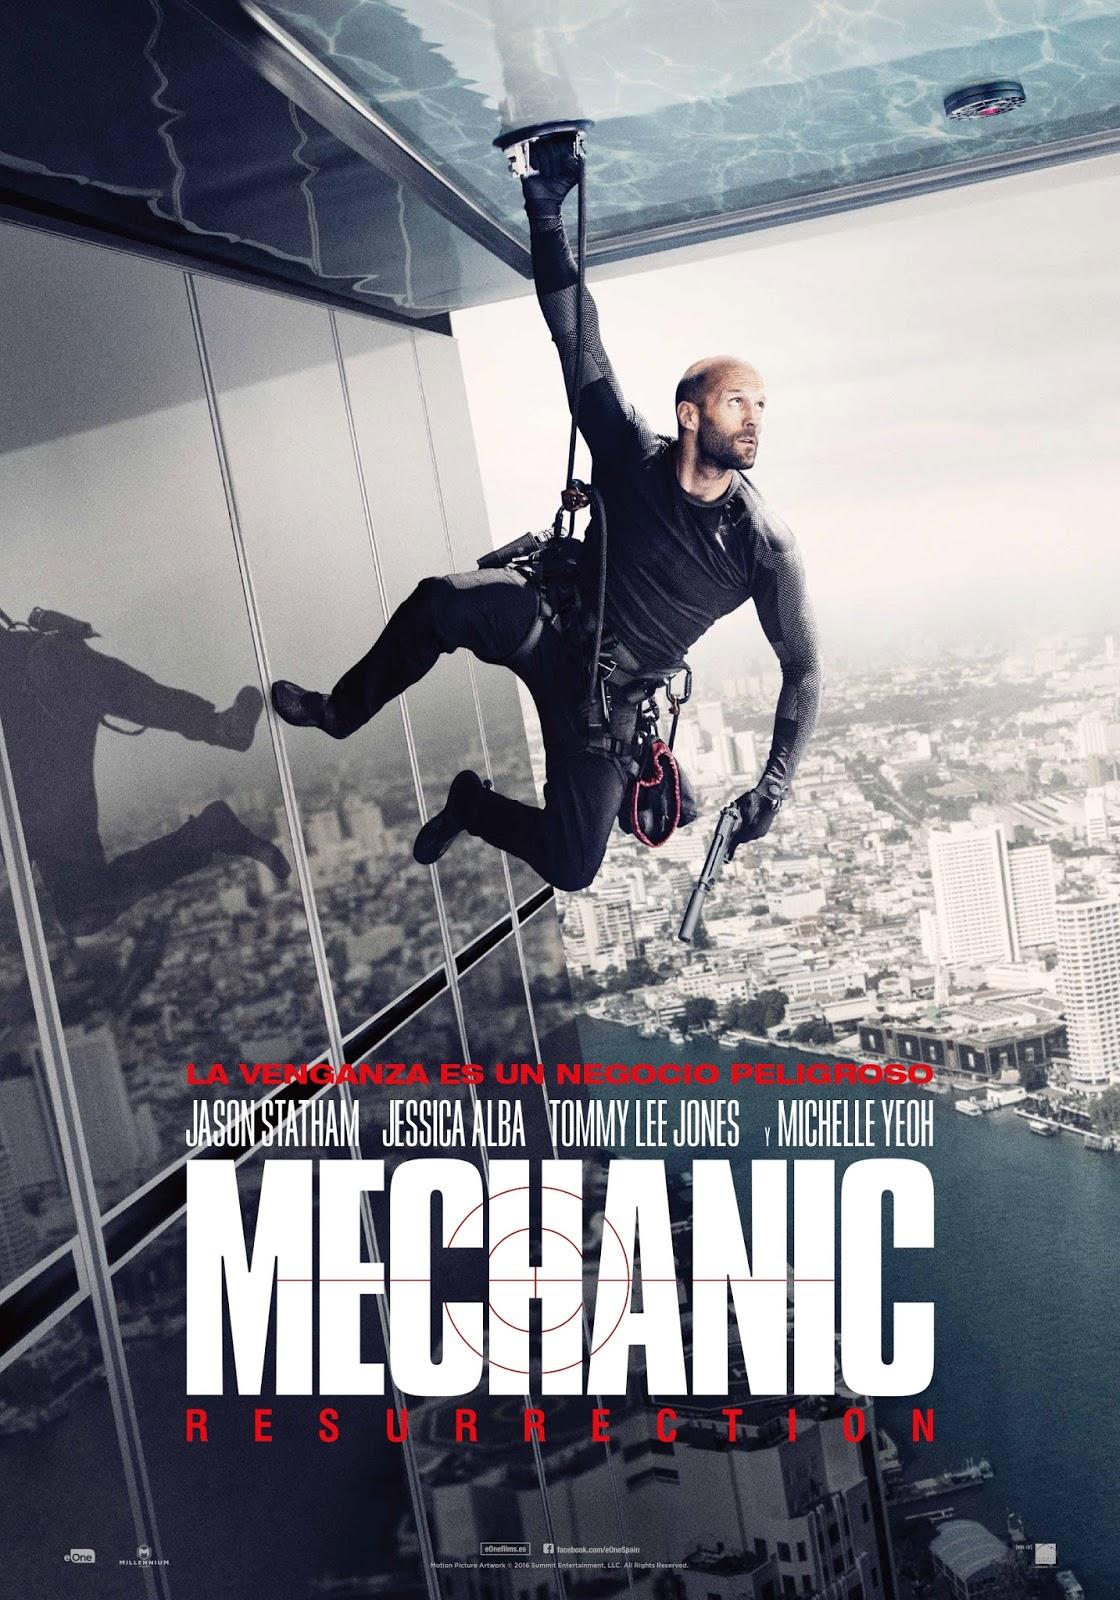 Tráiler y póster español de 'Mechanic: Resurrection' con Jason Statham